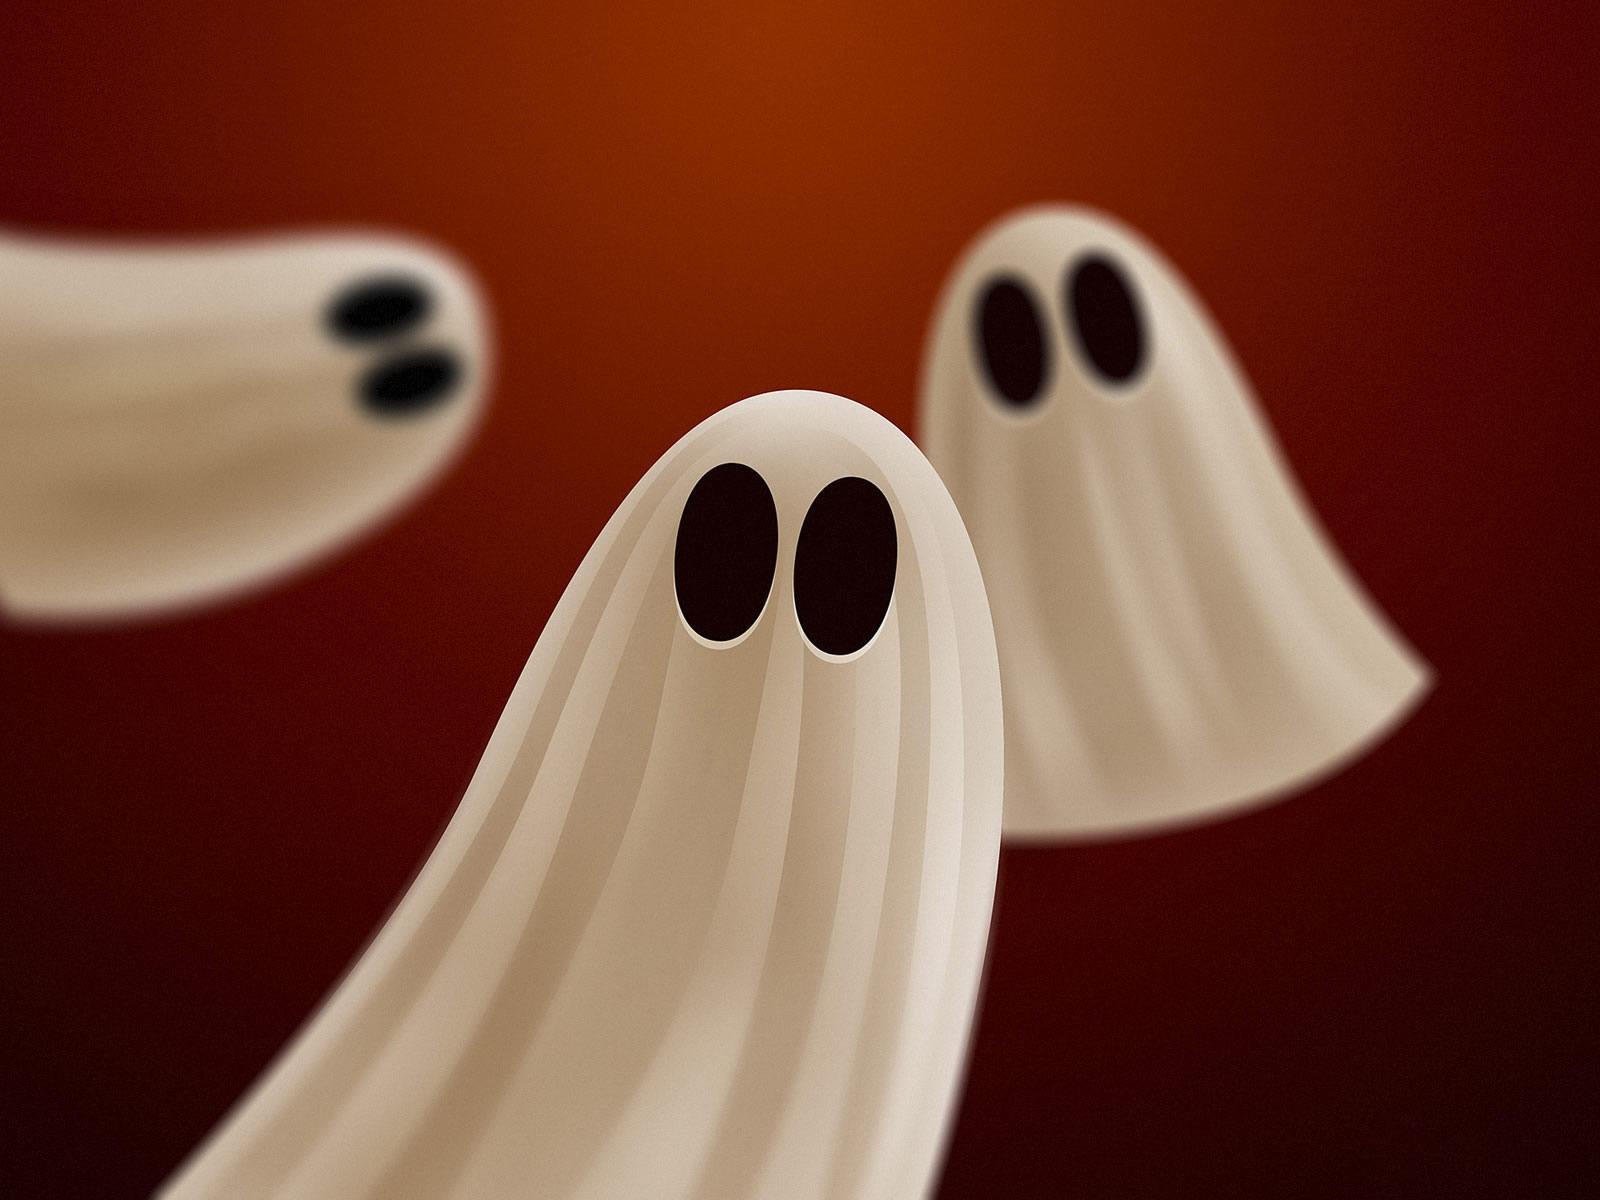 Wallpapers de Fantasmas Infantiles